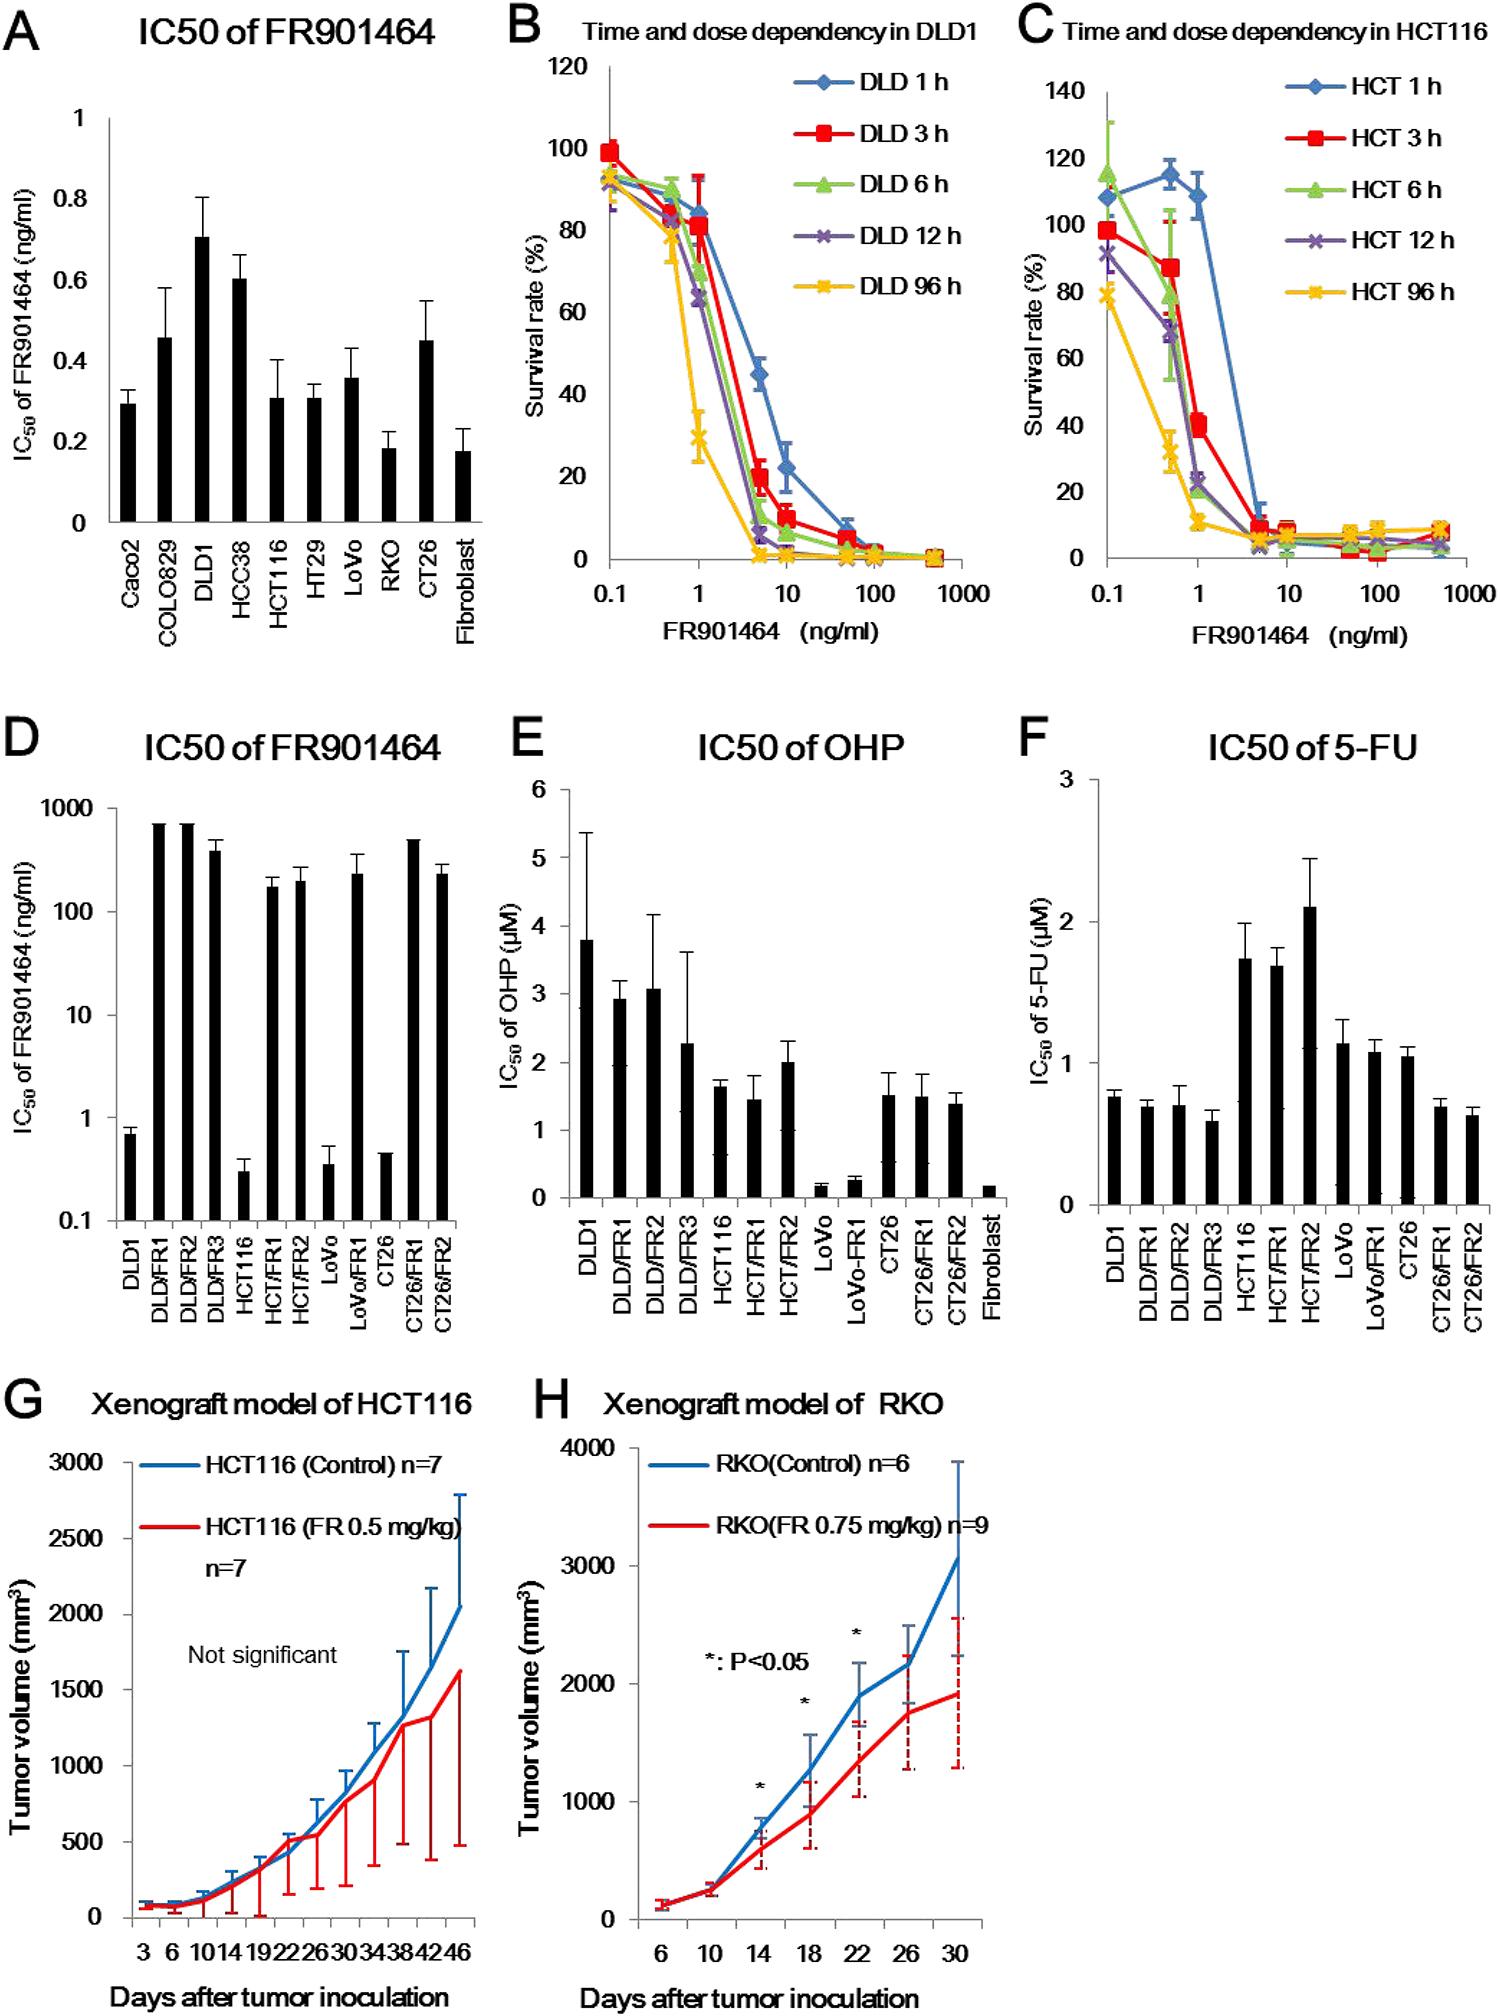 Cytotoxic effect of FR901464 in vitro and in vivo.